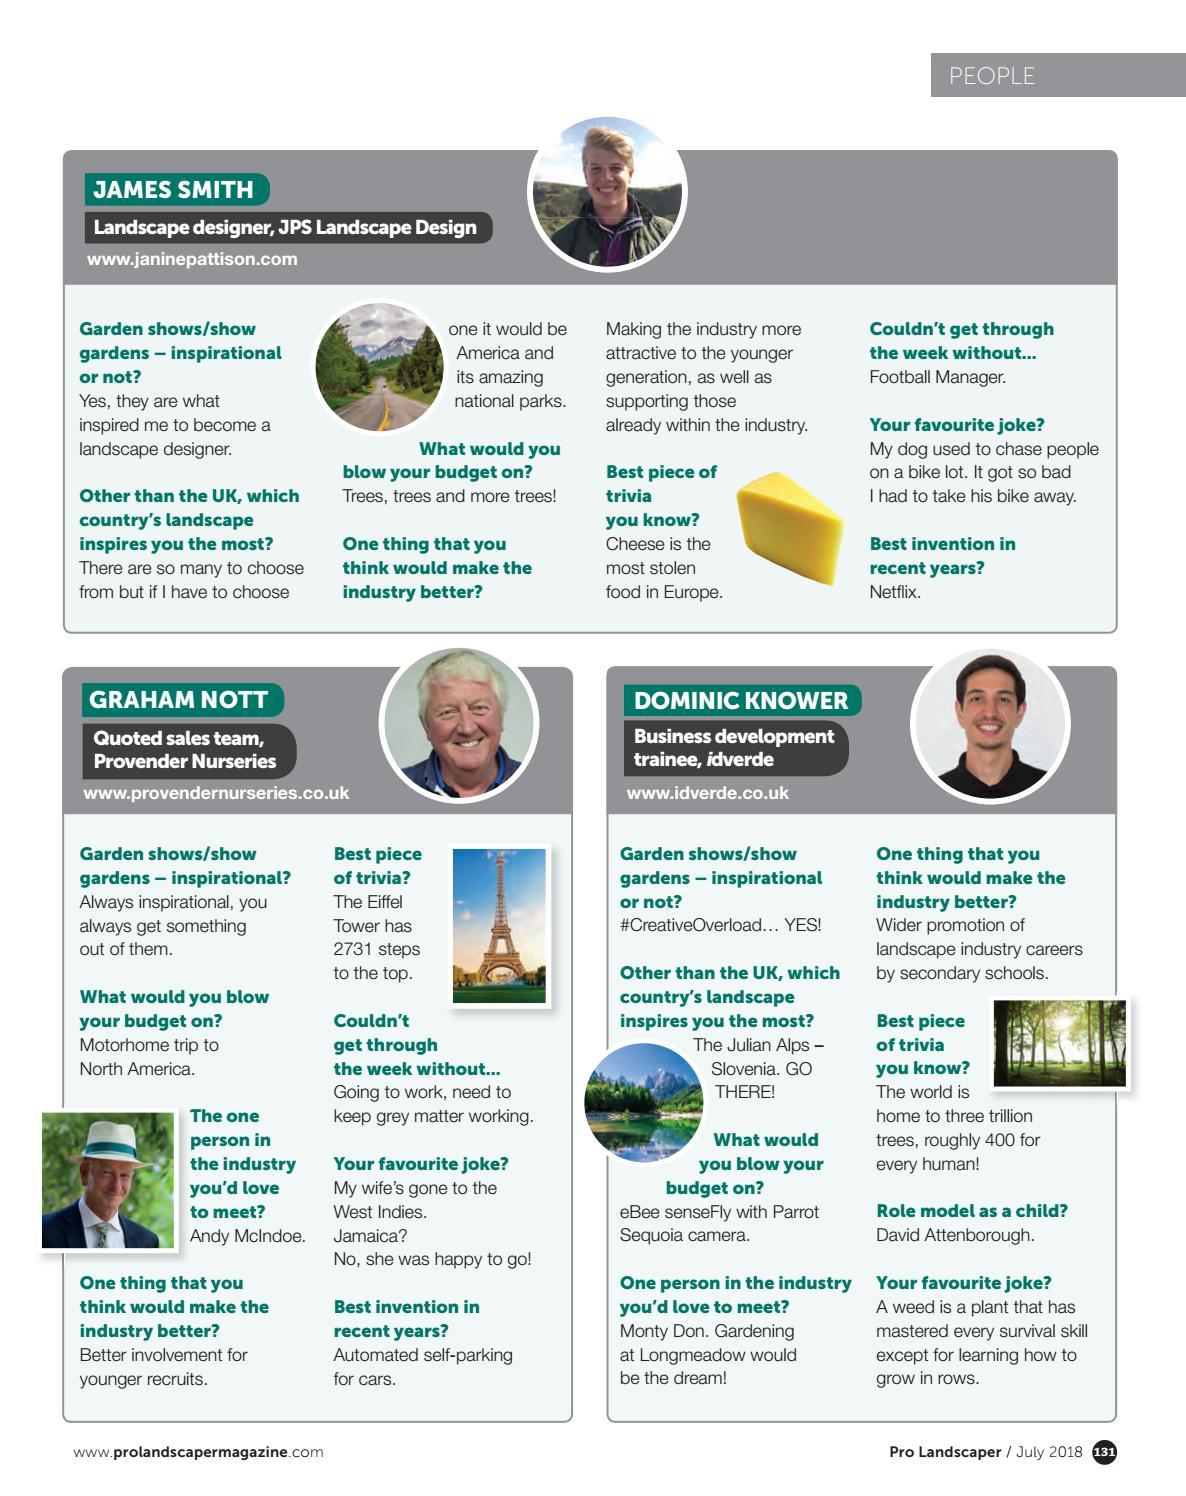 Pro Landscaper July 2018 by Eljays44 - issuu